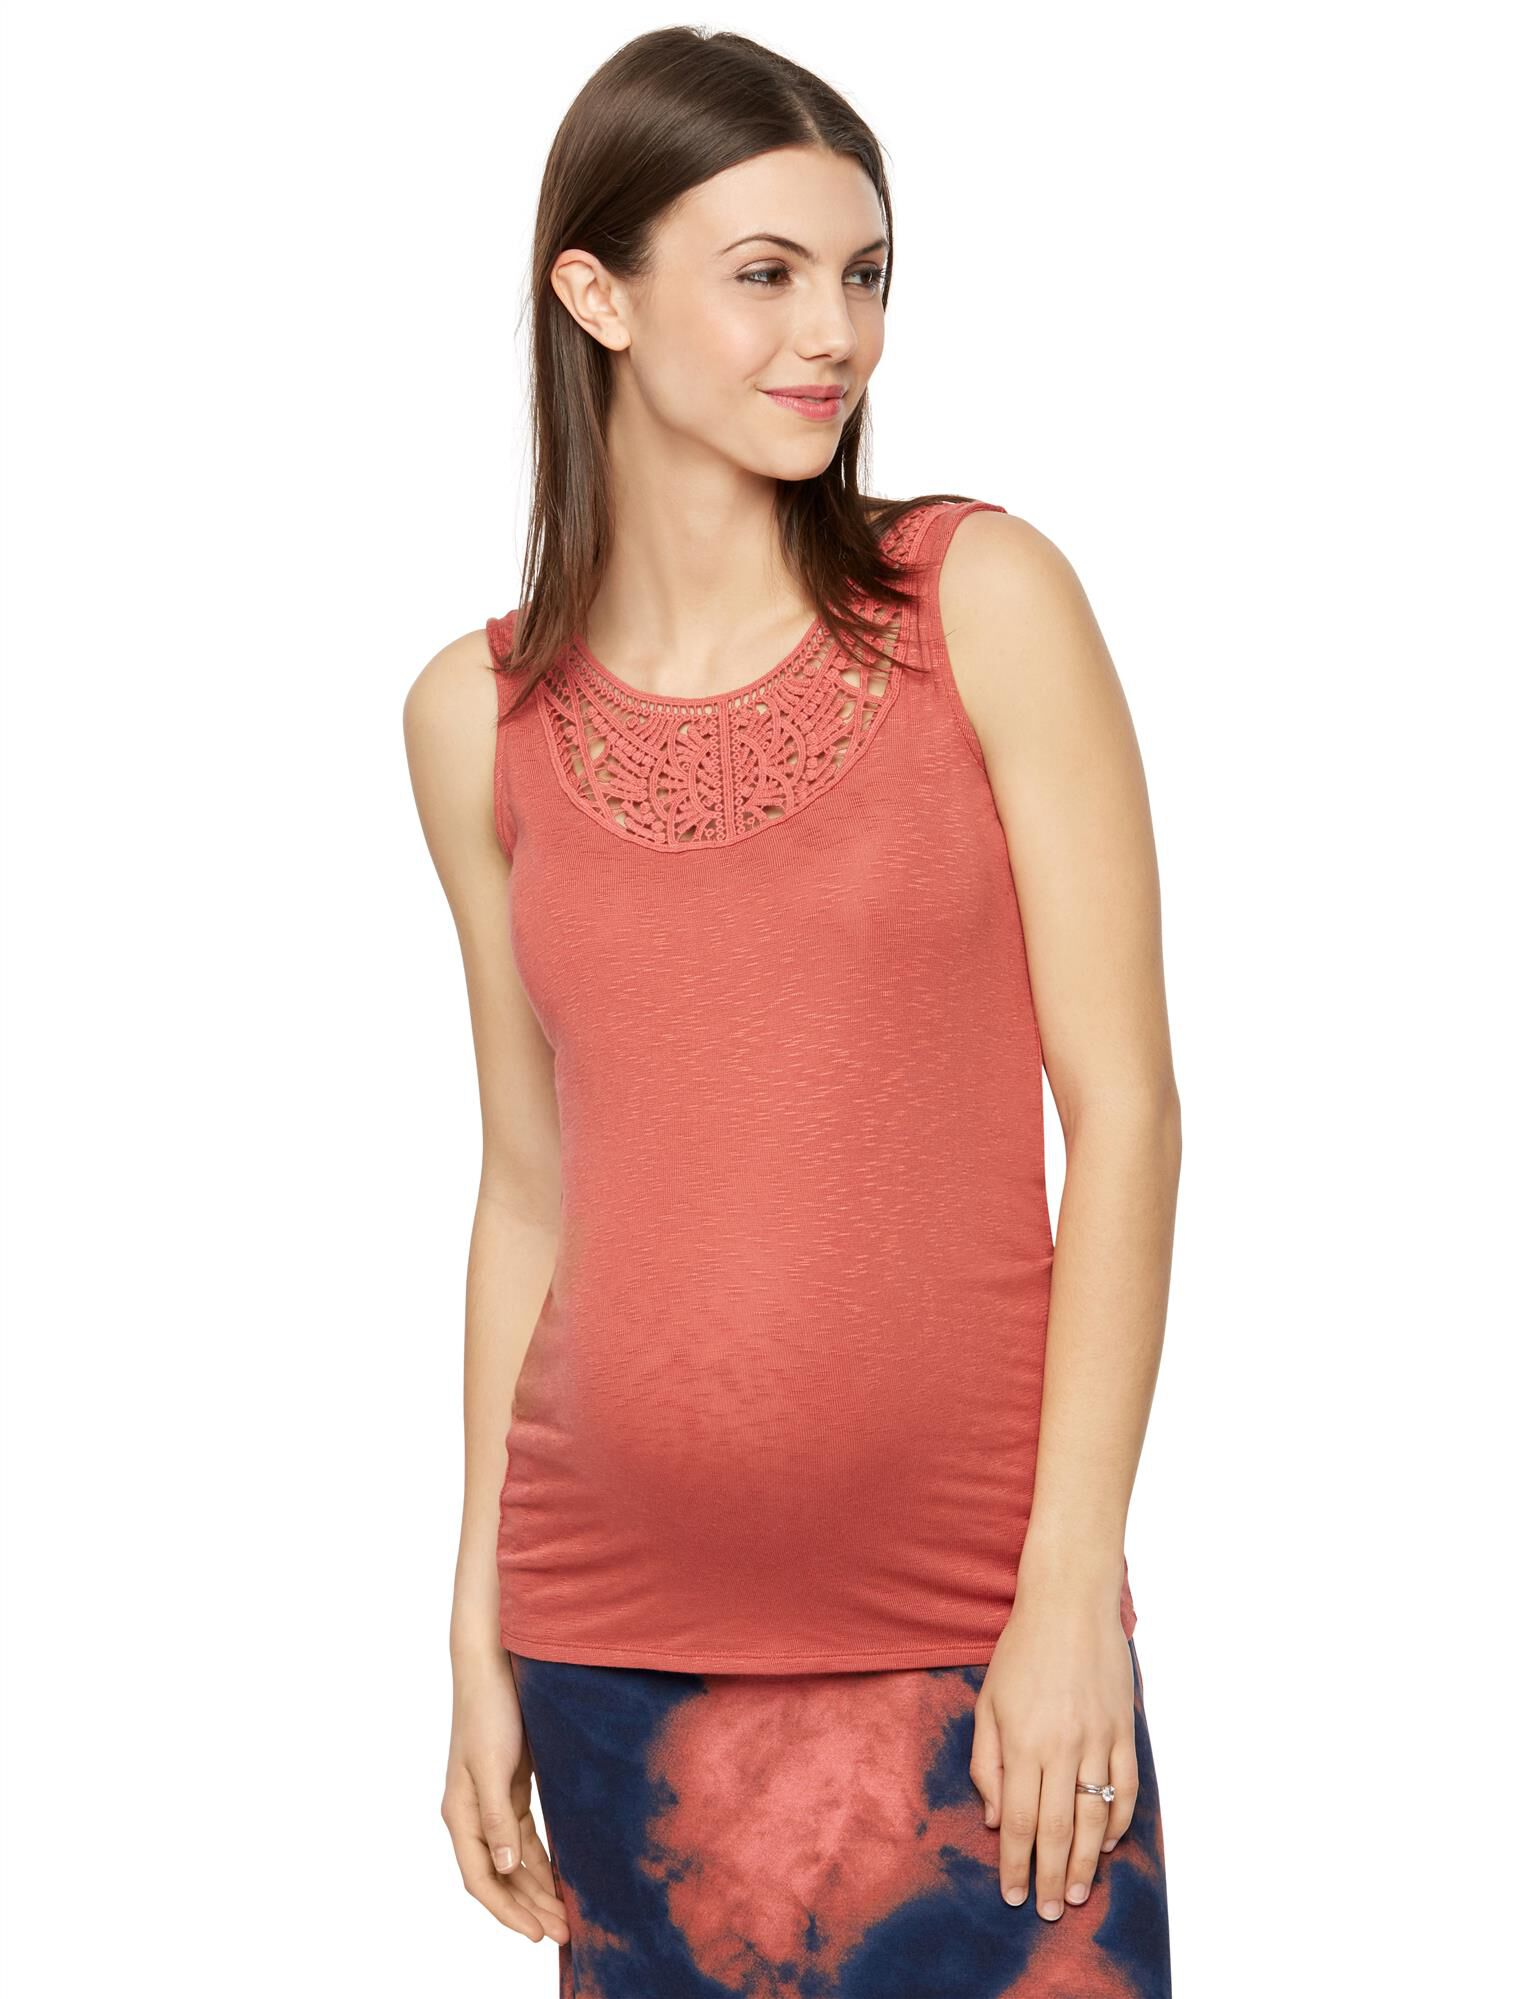 Crochet Detail Maternity Tank Top